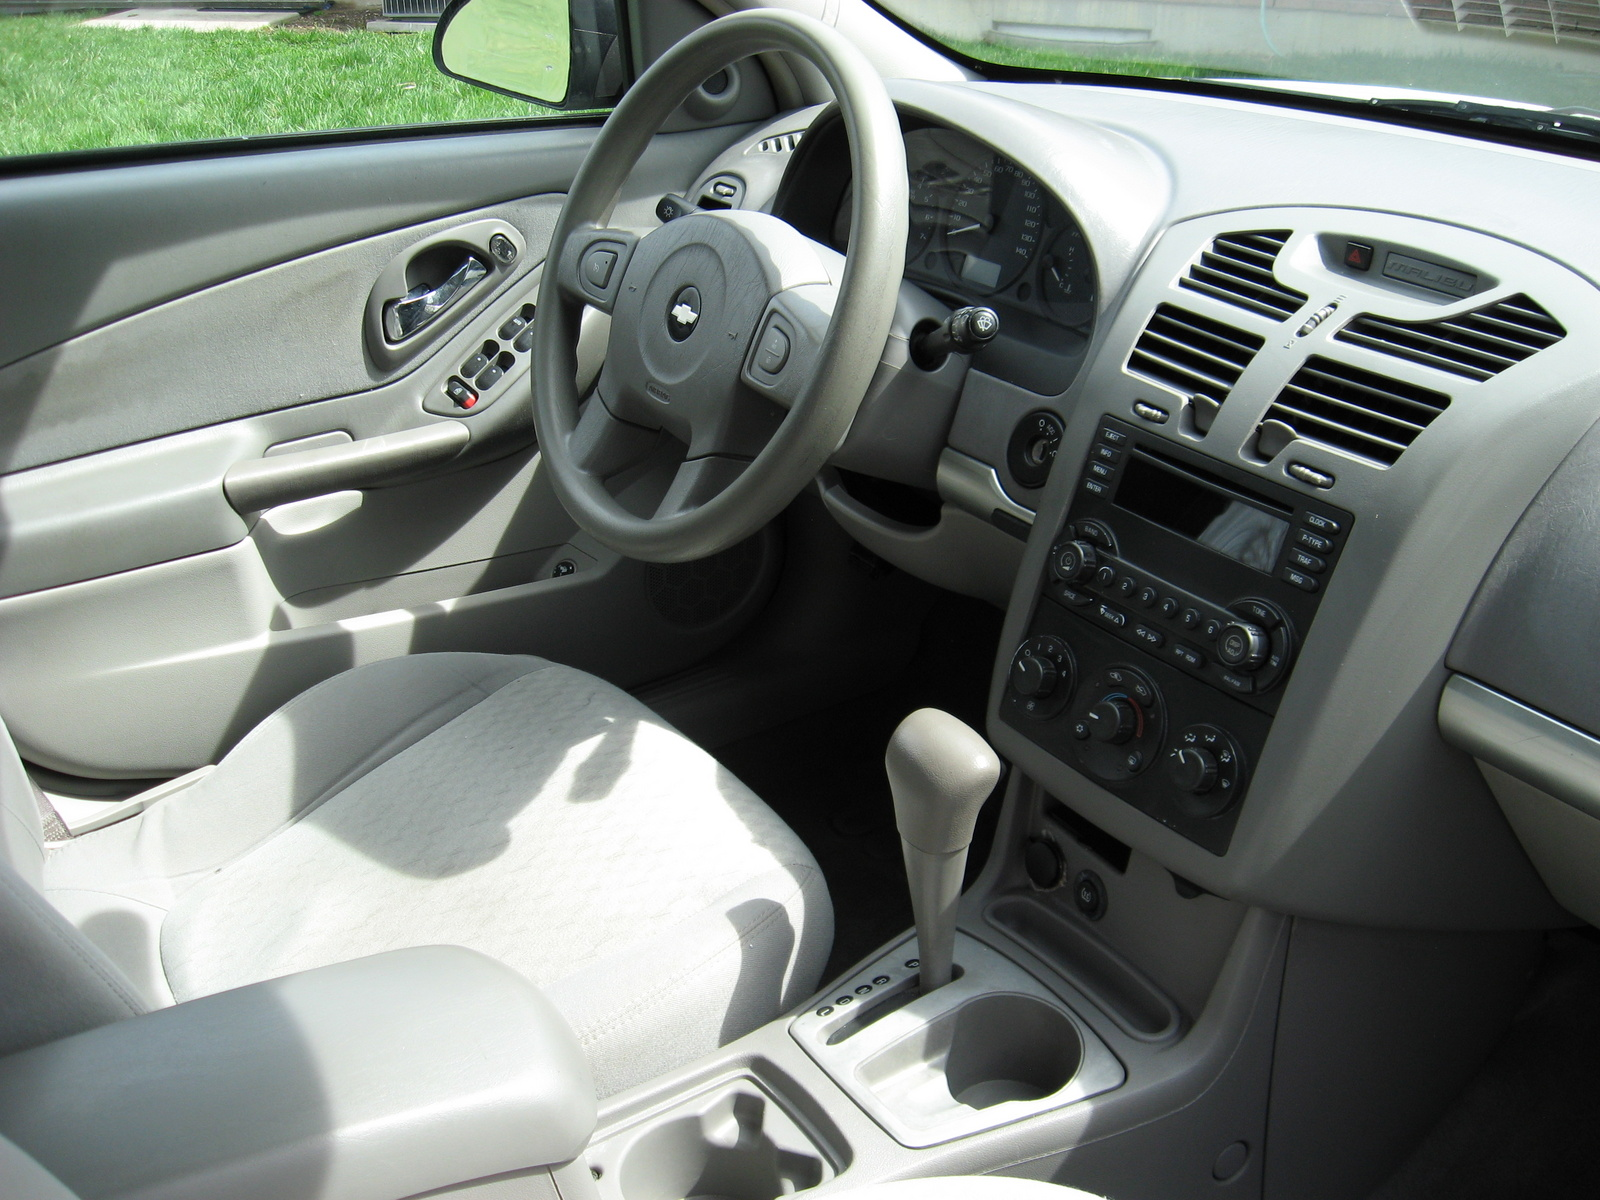 2005 chevrolet malibu - interior pictures